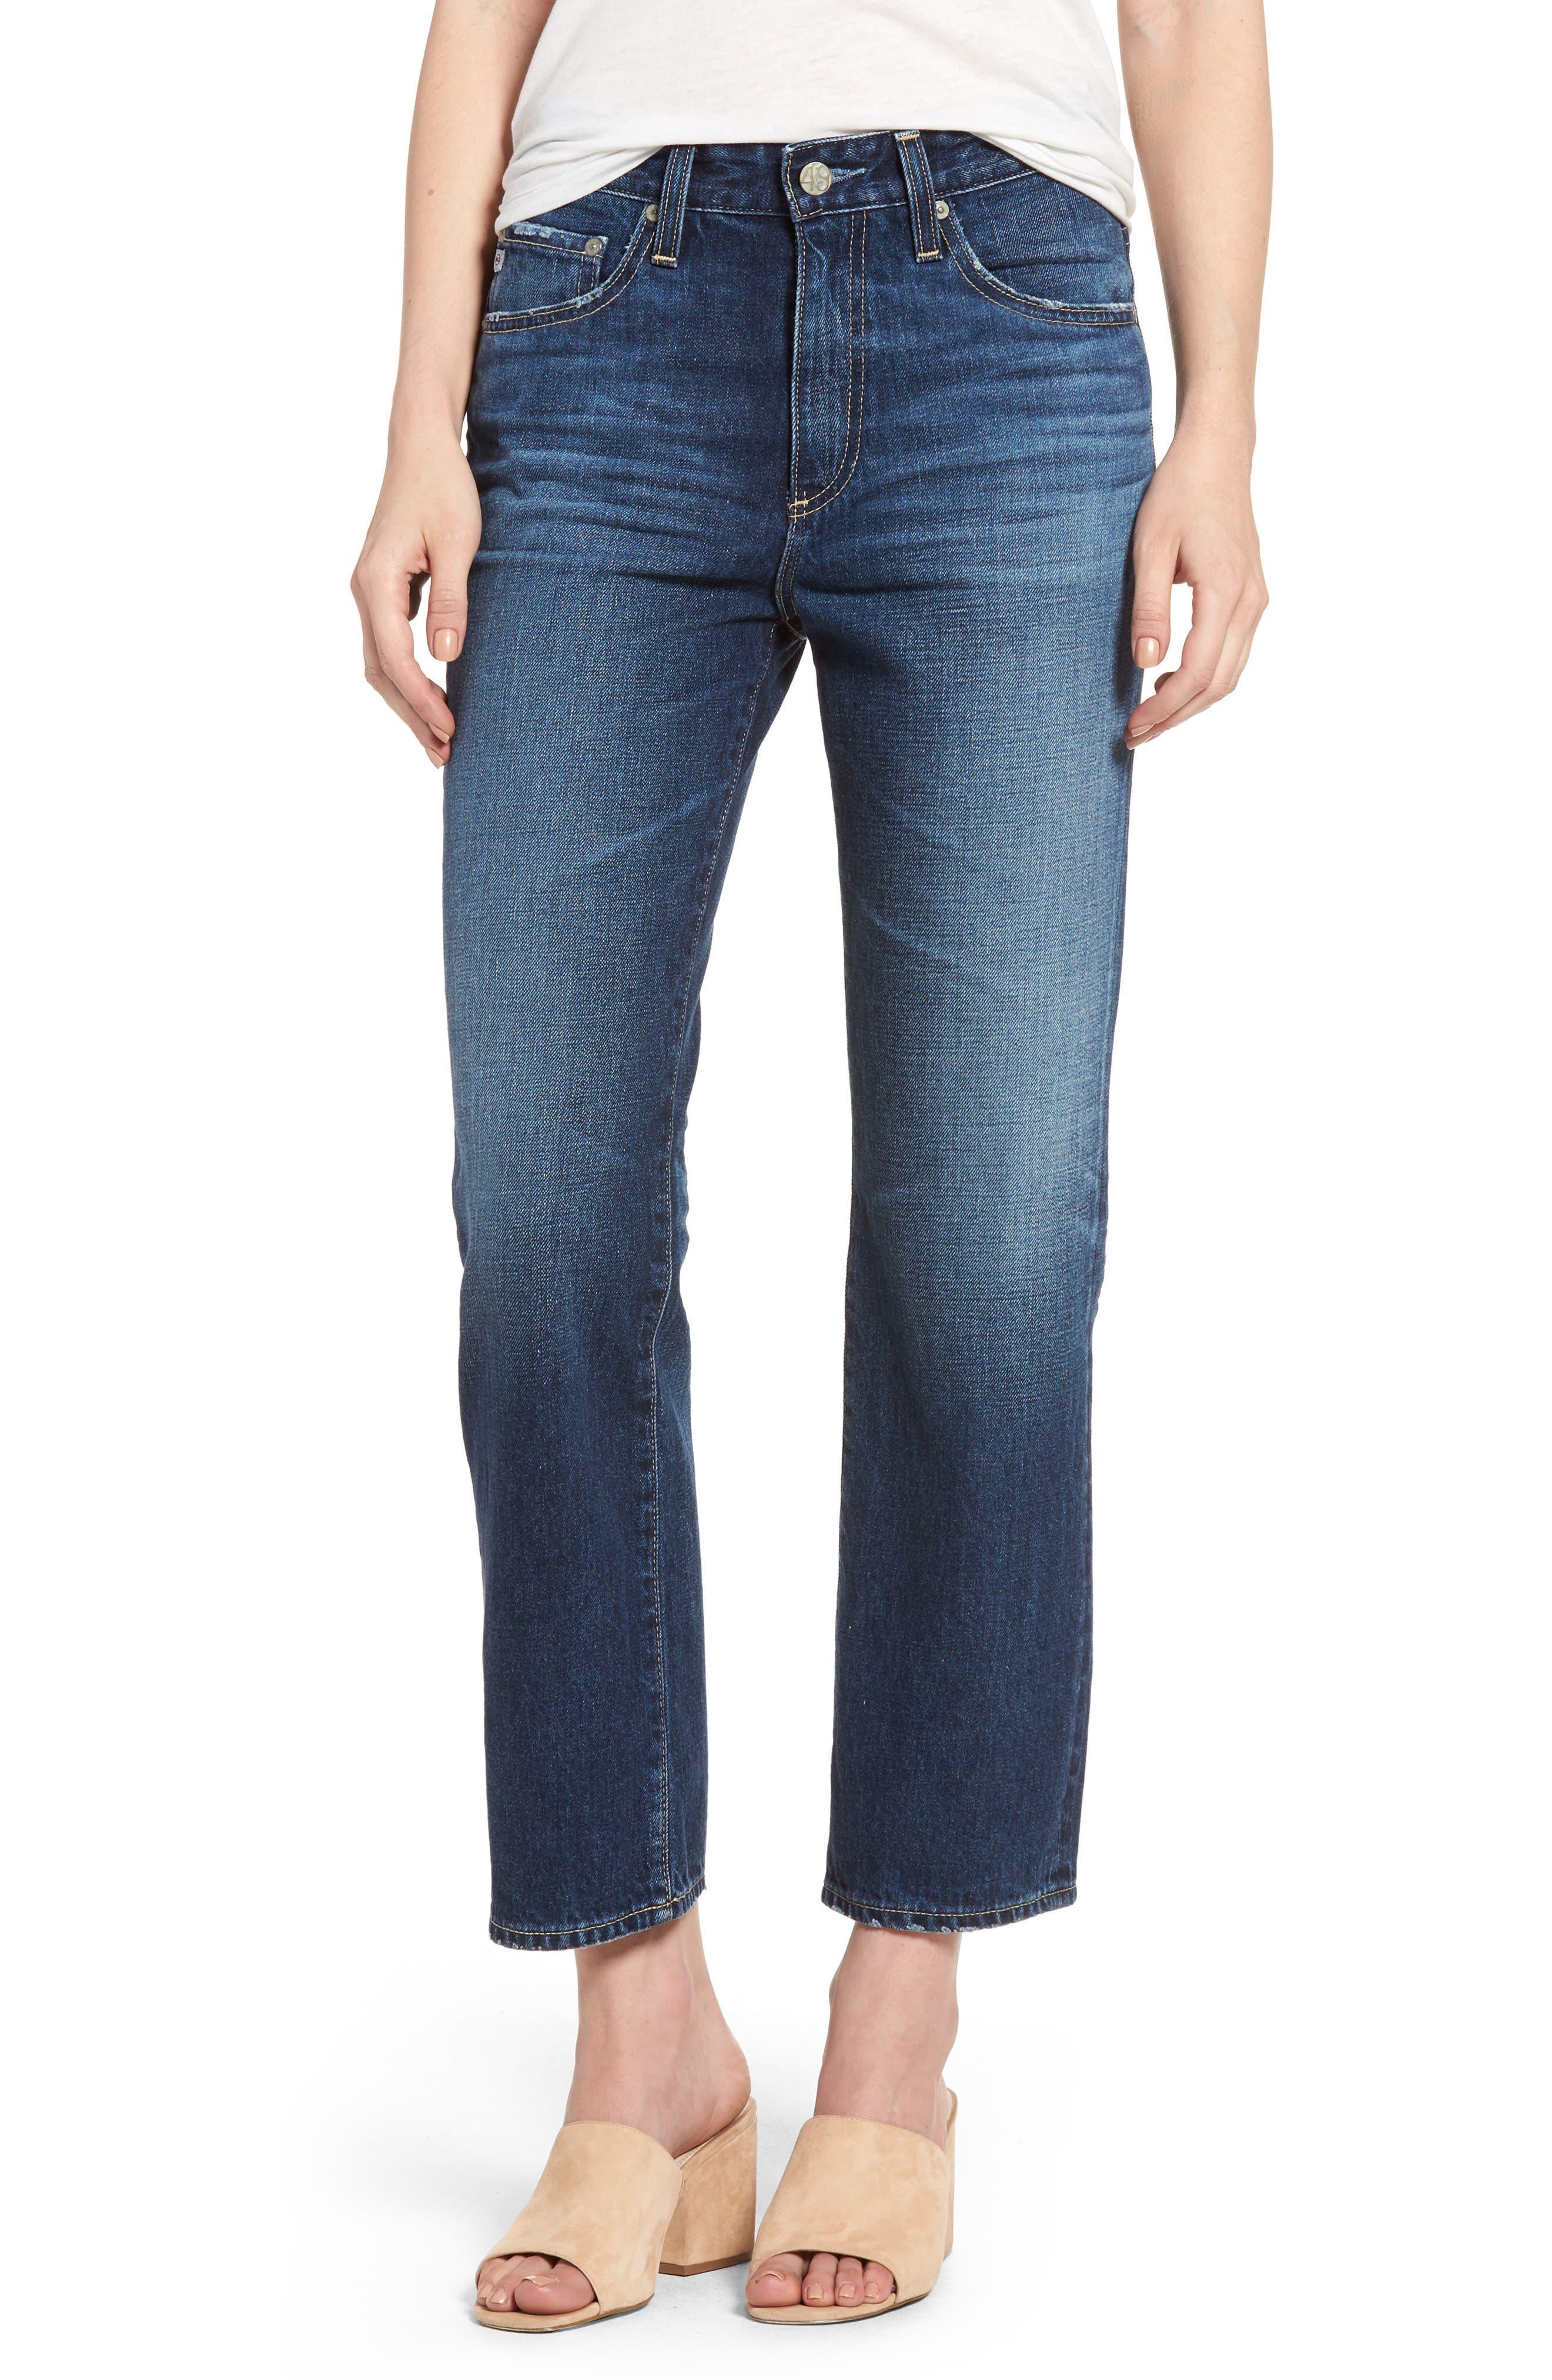 AG The Rhett Vintage High Waist Crop Jeans